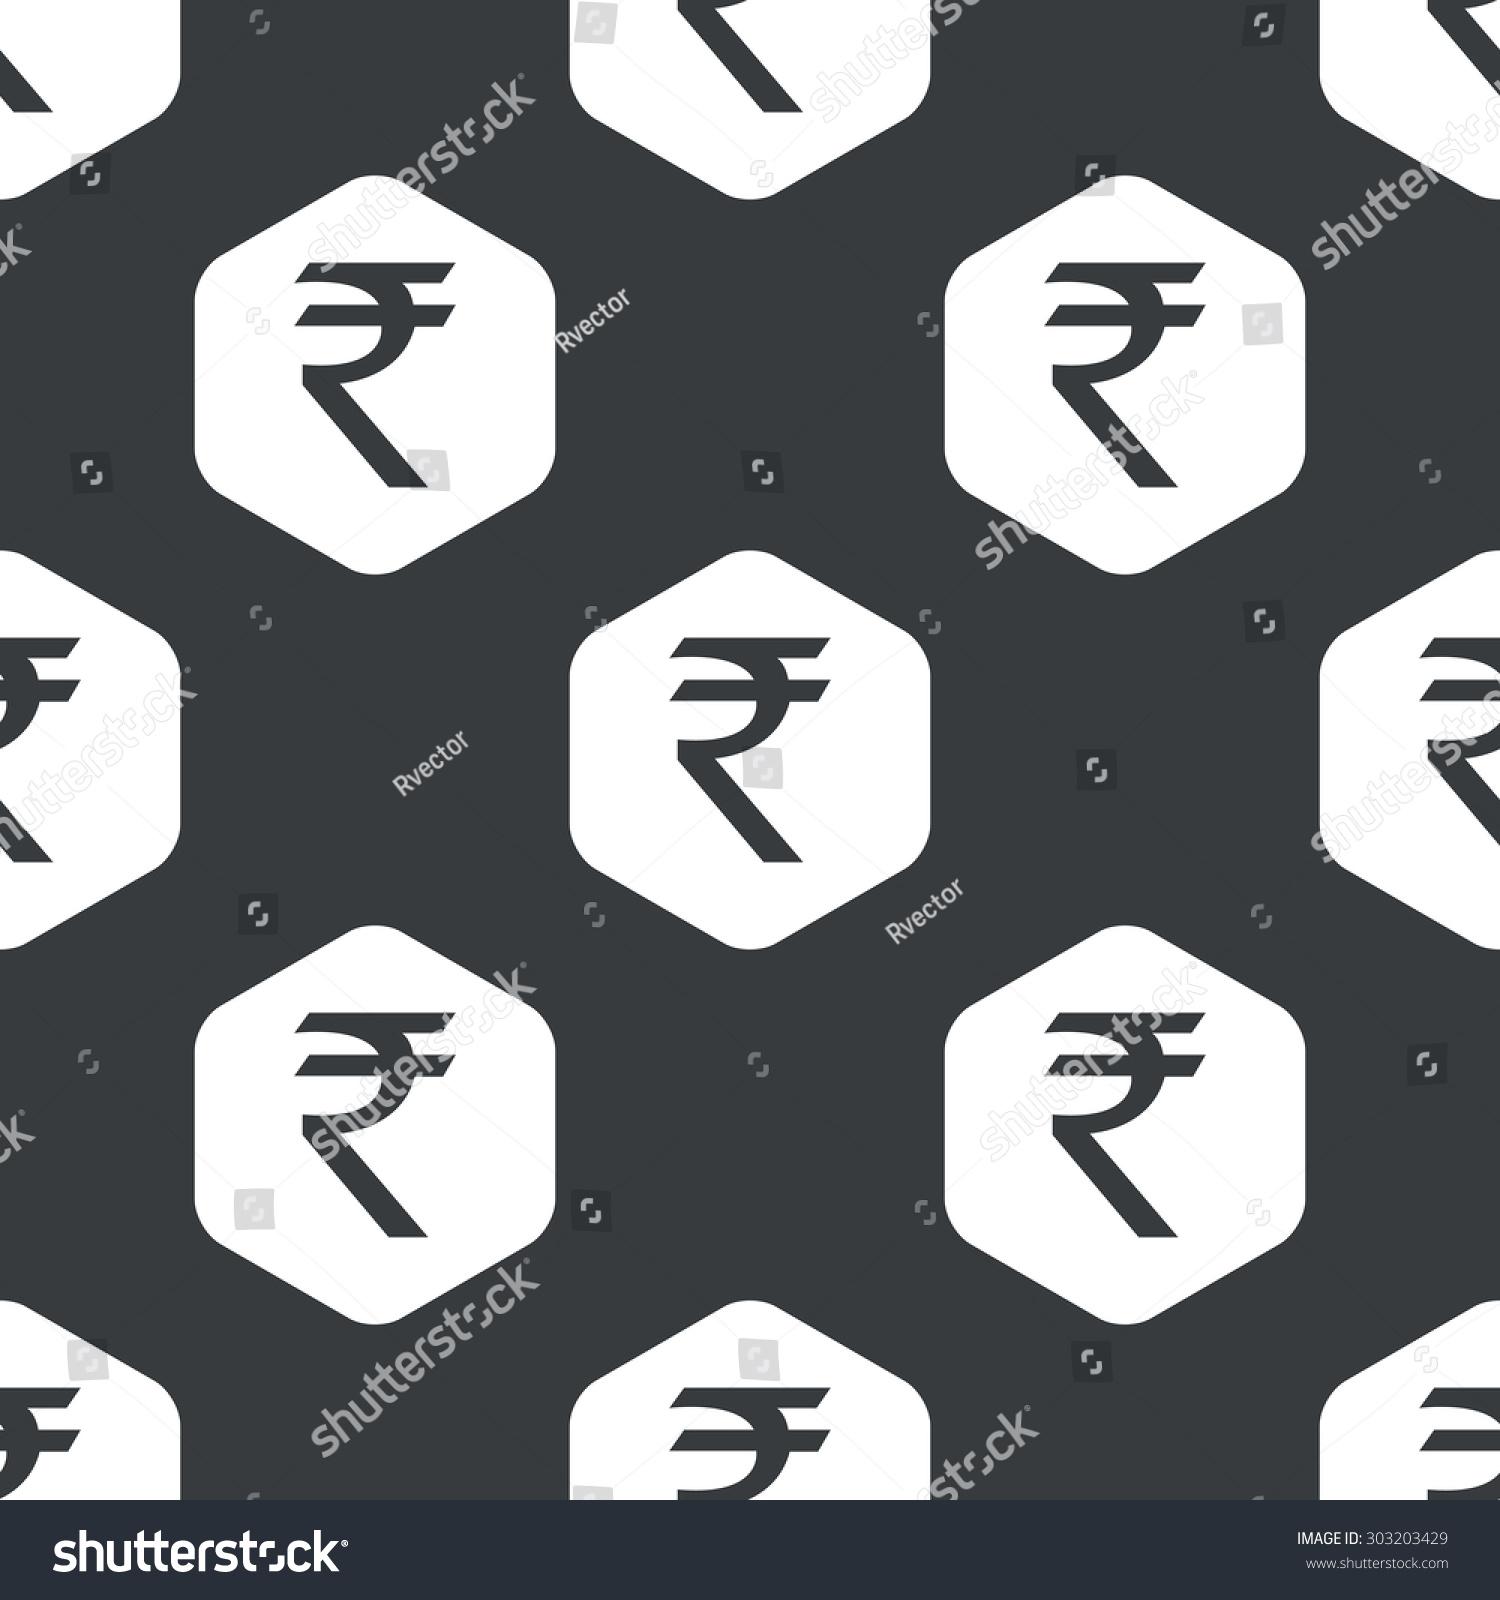 Image indian rupee symbol hexagon repeated stock vector 303203429 image of indian rupee symbol in hexagon repeated on black buycottarizona